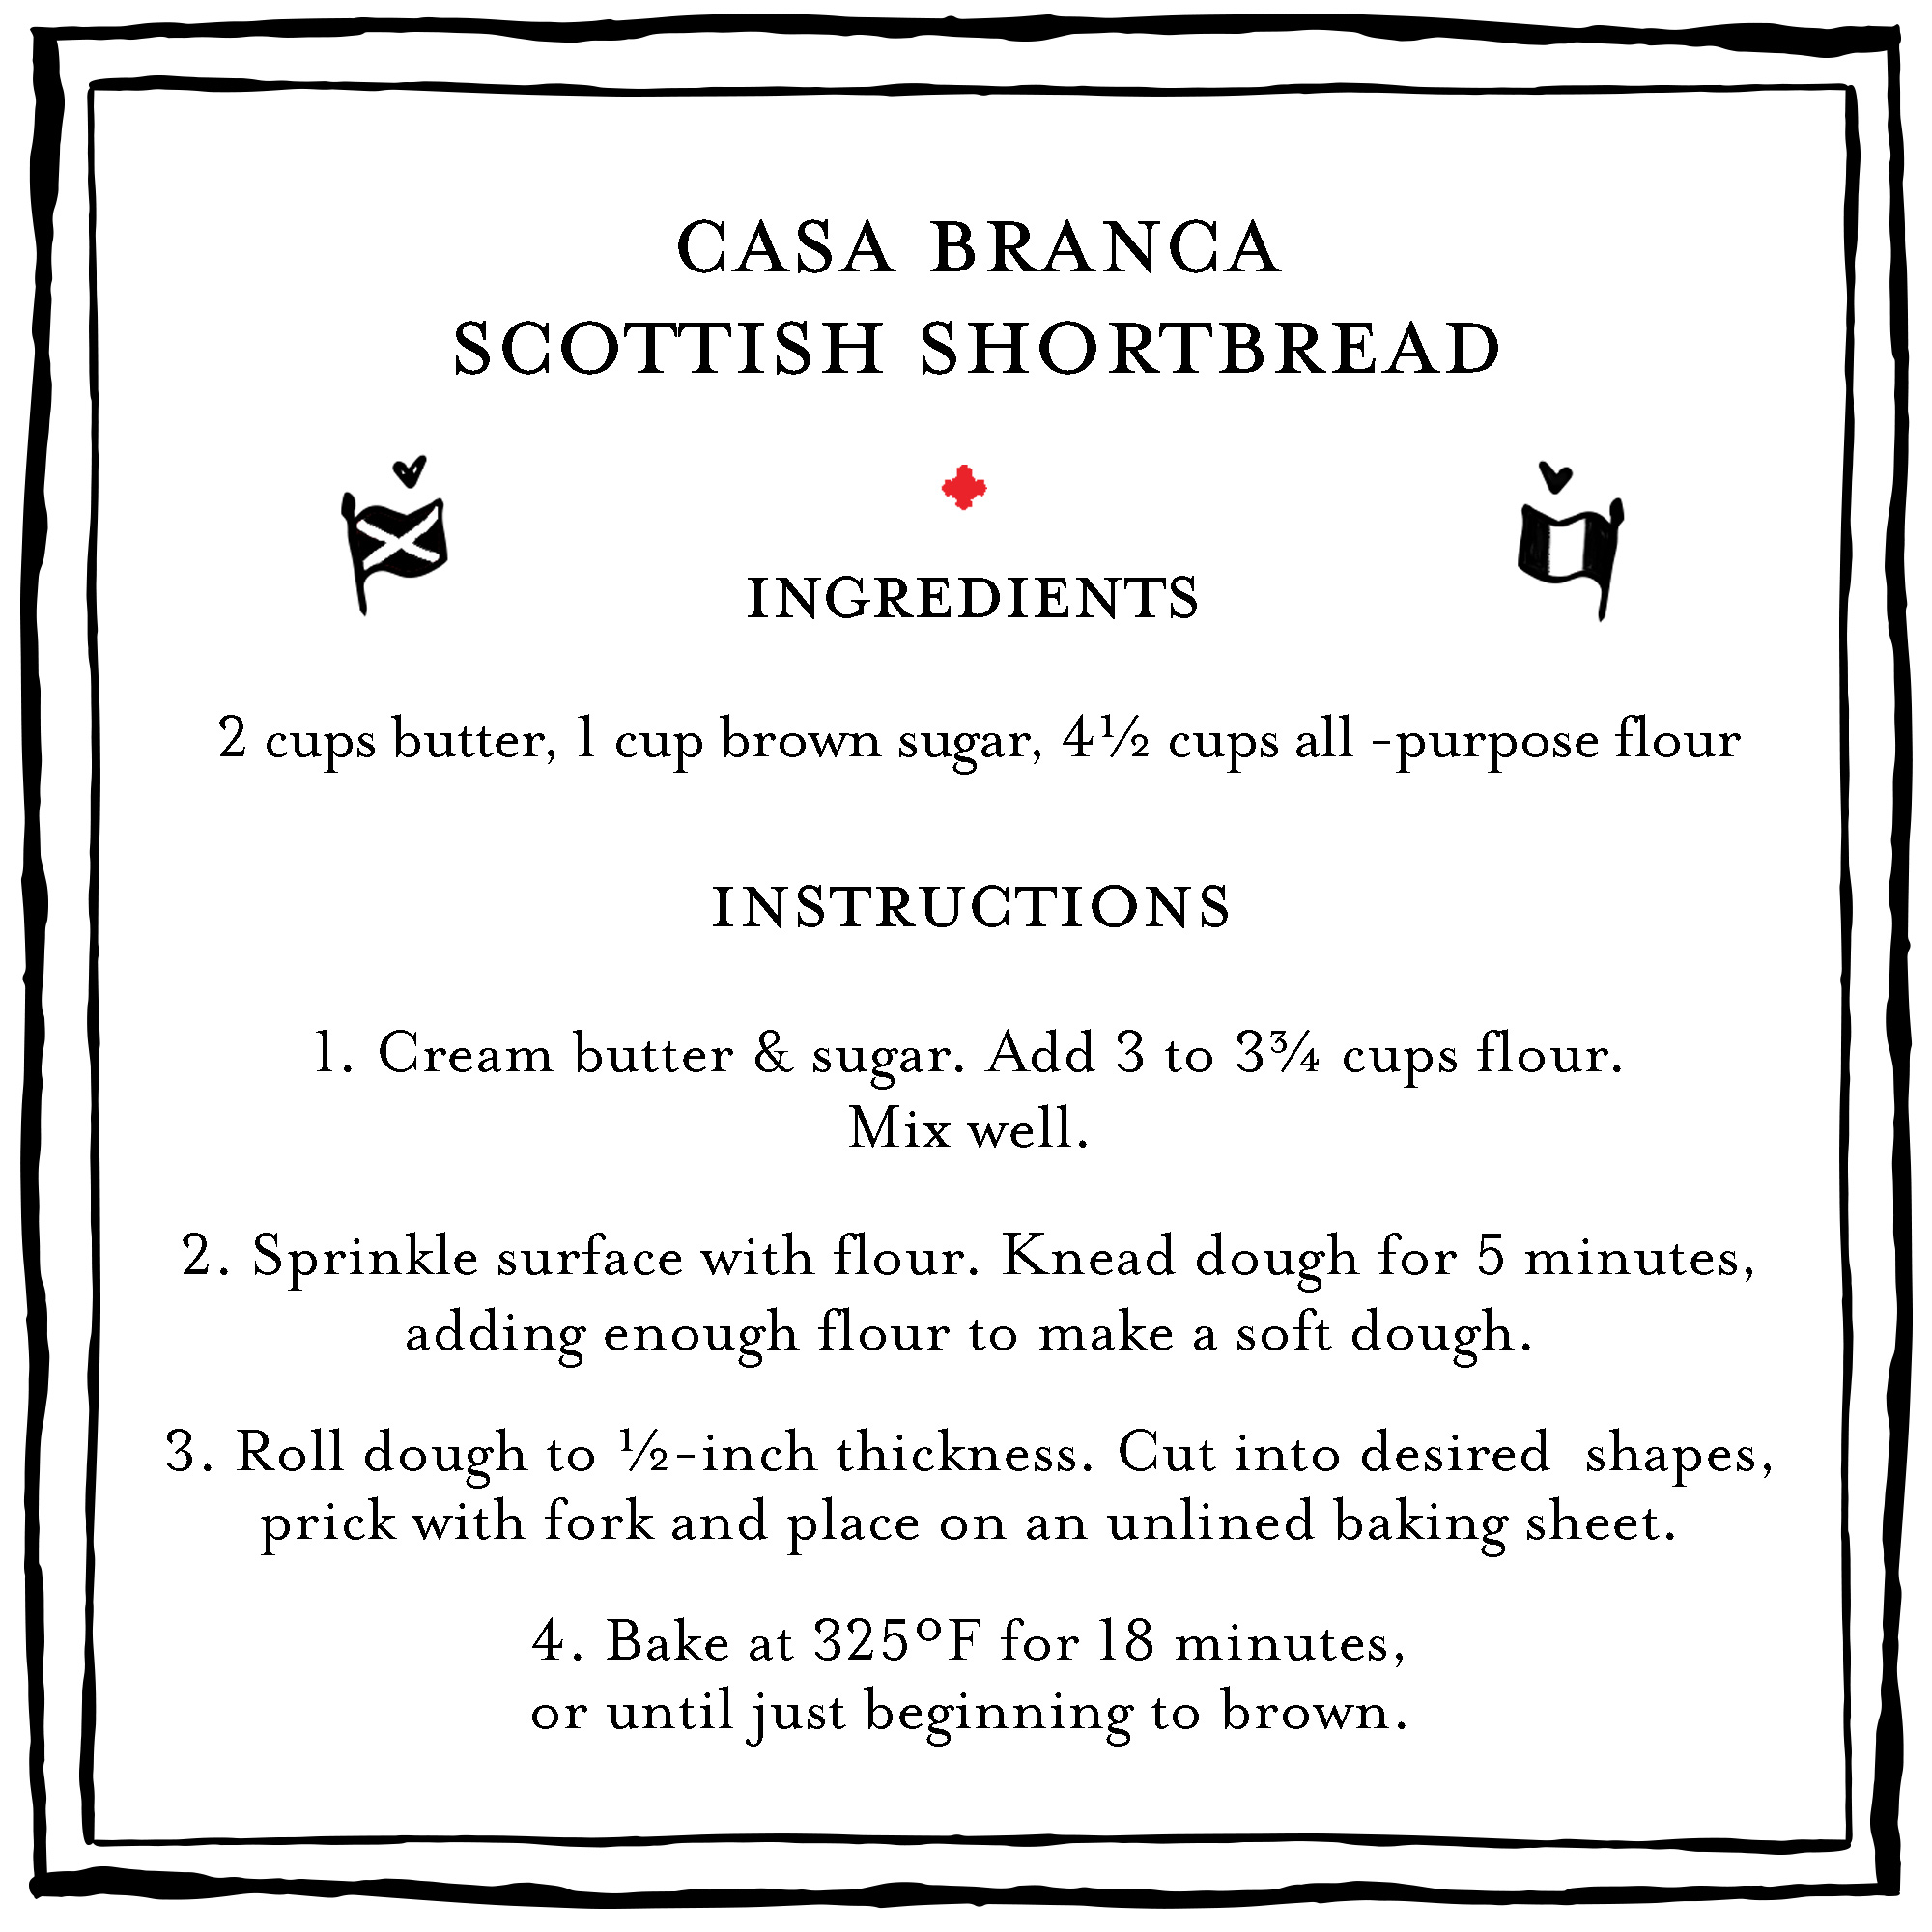 Casa Branca Scottish Shortbread